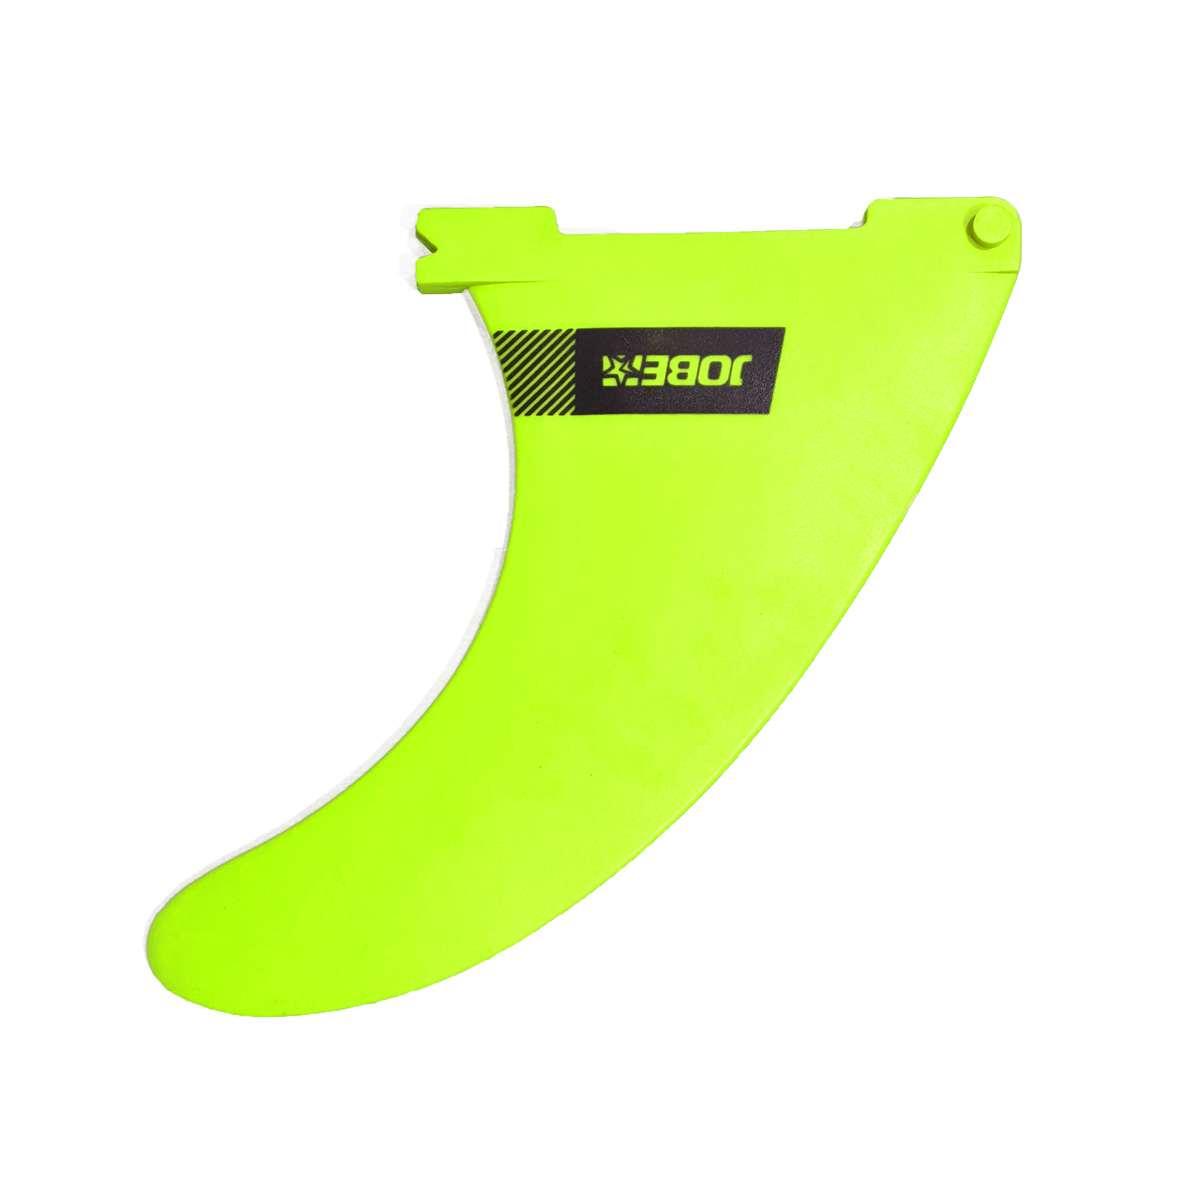 Jobe Aero SUP Fin Lime